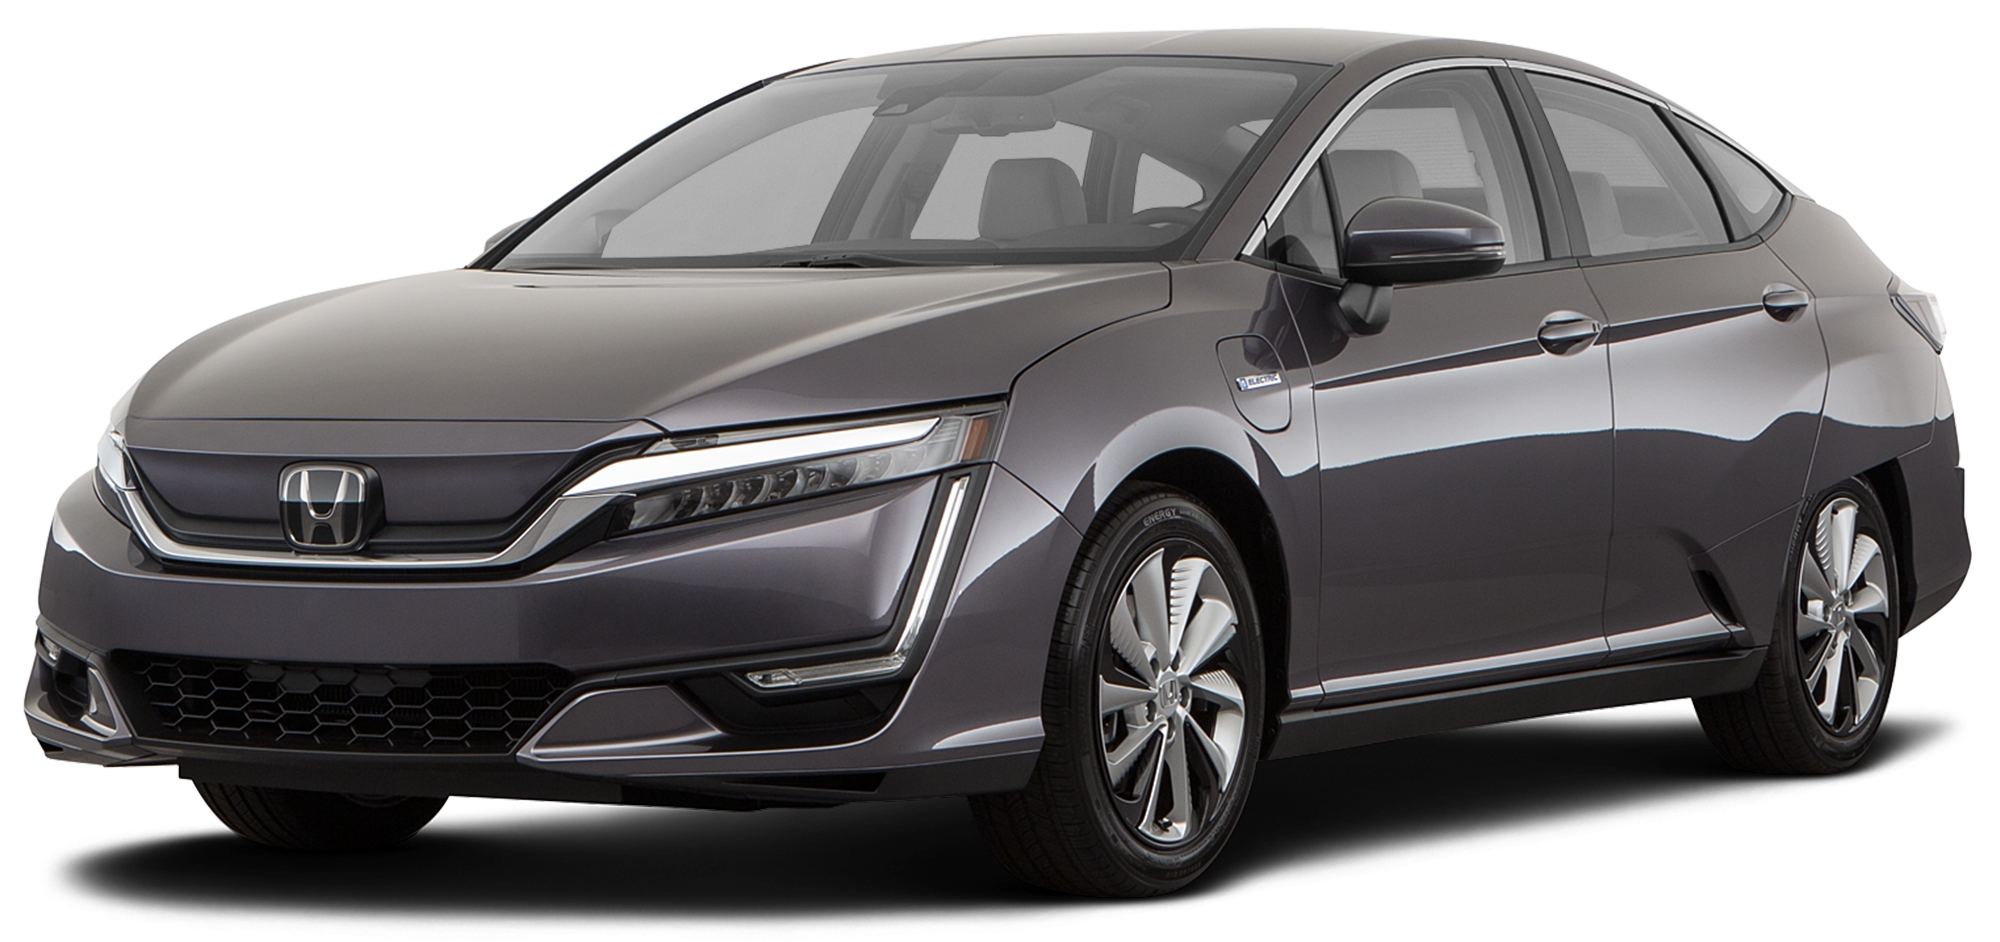 2019 Honda Clarity Electric Incentives Specials Offers In Walnut Creek Ca